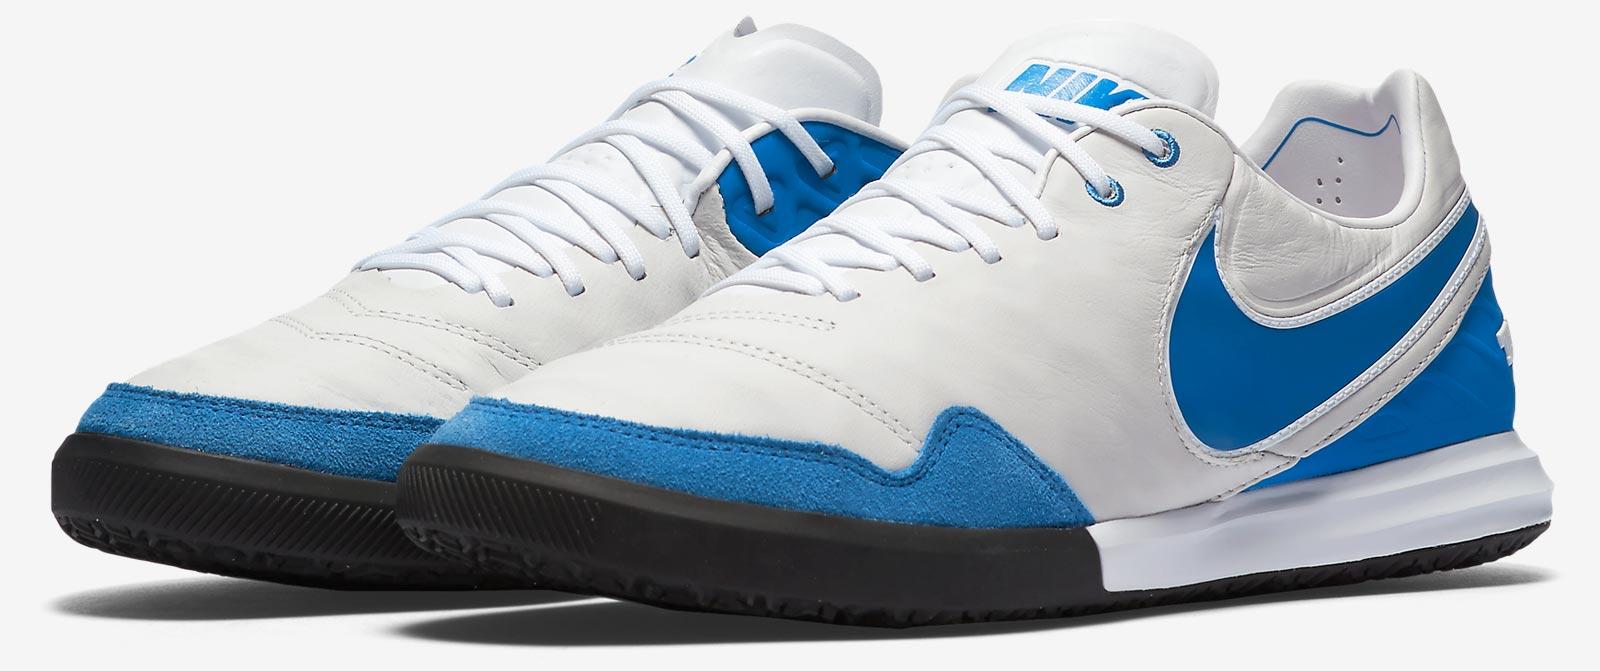 69c583438fc Wholesale Summit White Nike TiempoX Proximo Boots Released